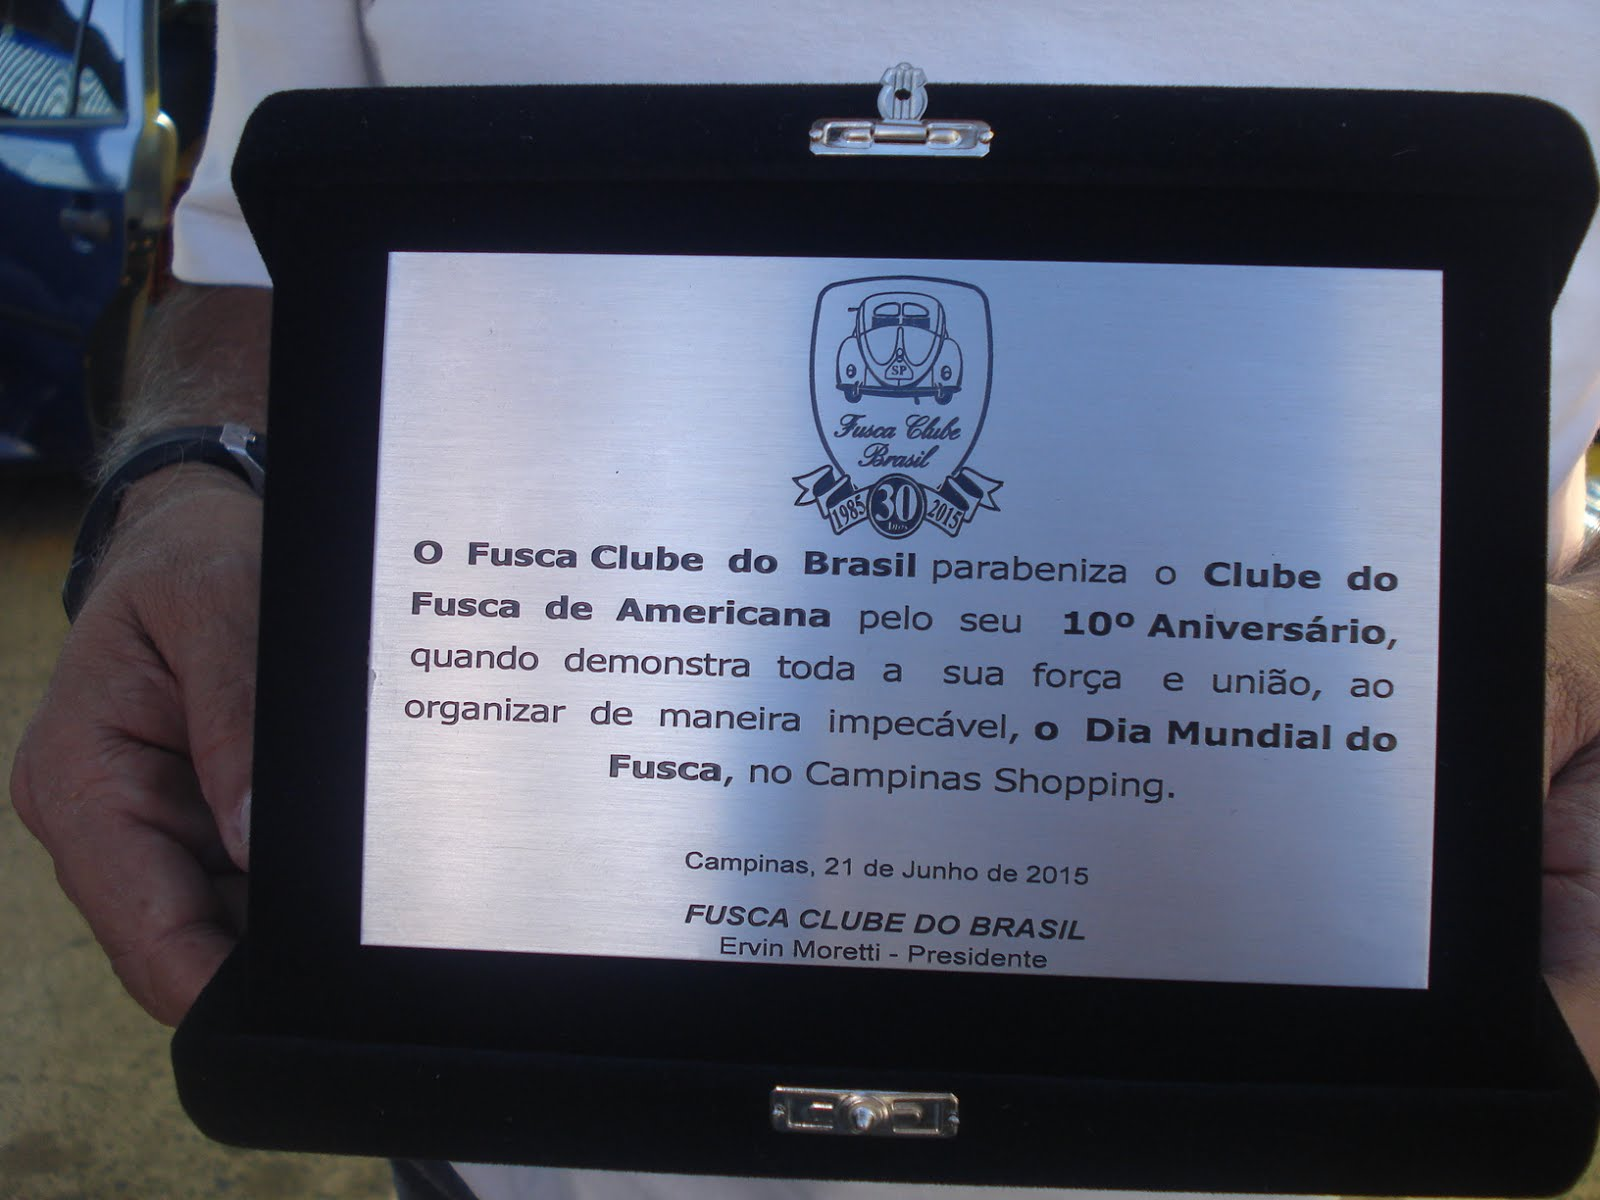 Honraria recebida do Fusca Clube do Brasil